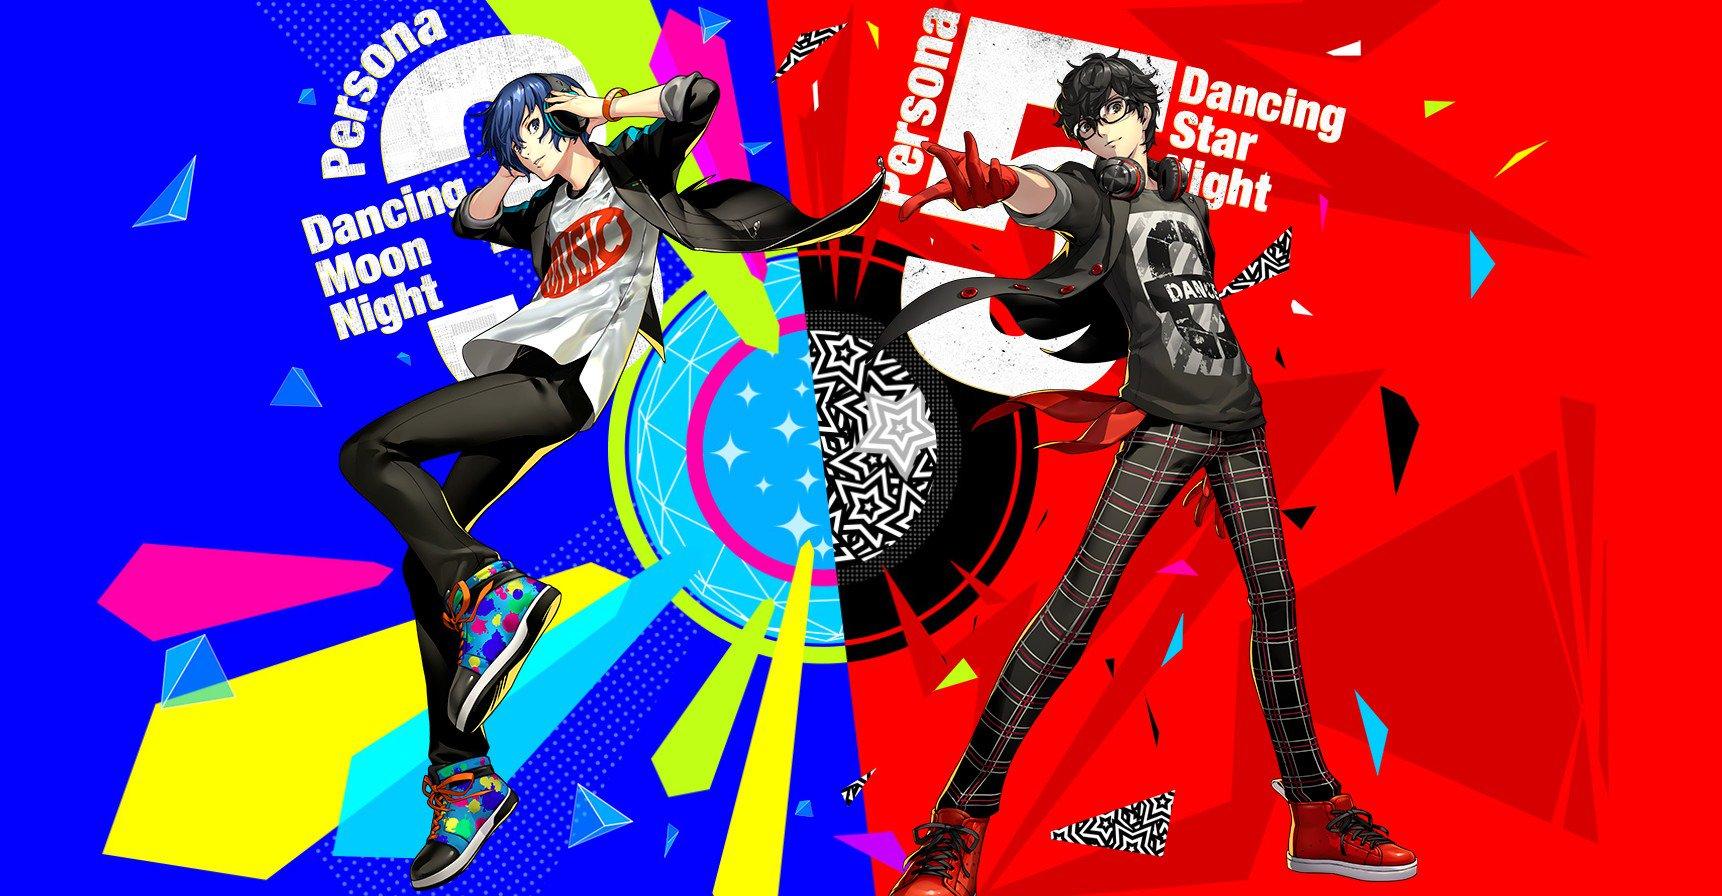 P3 - P5 Dancing Edition